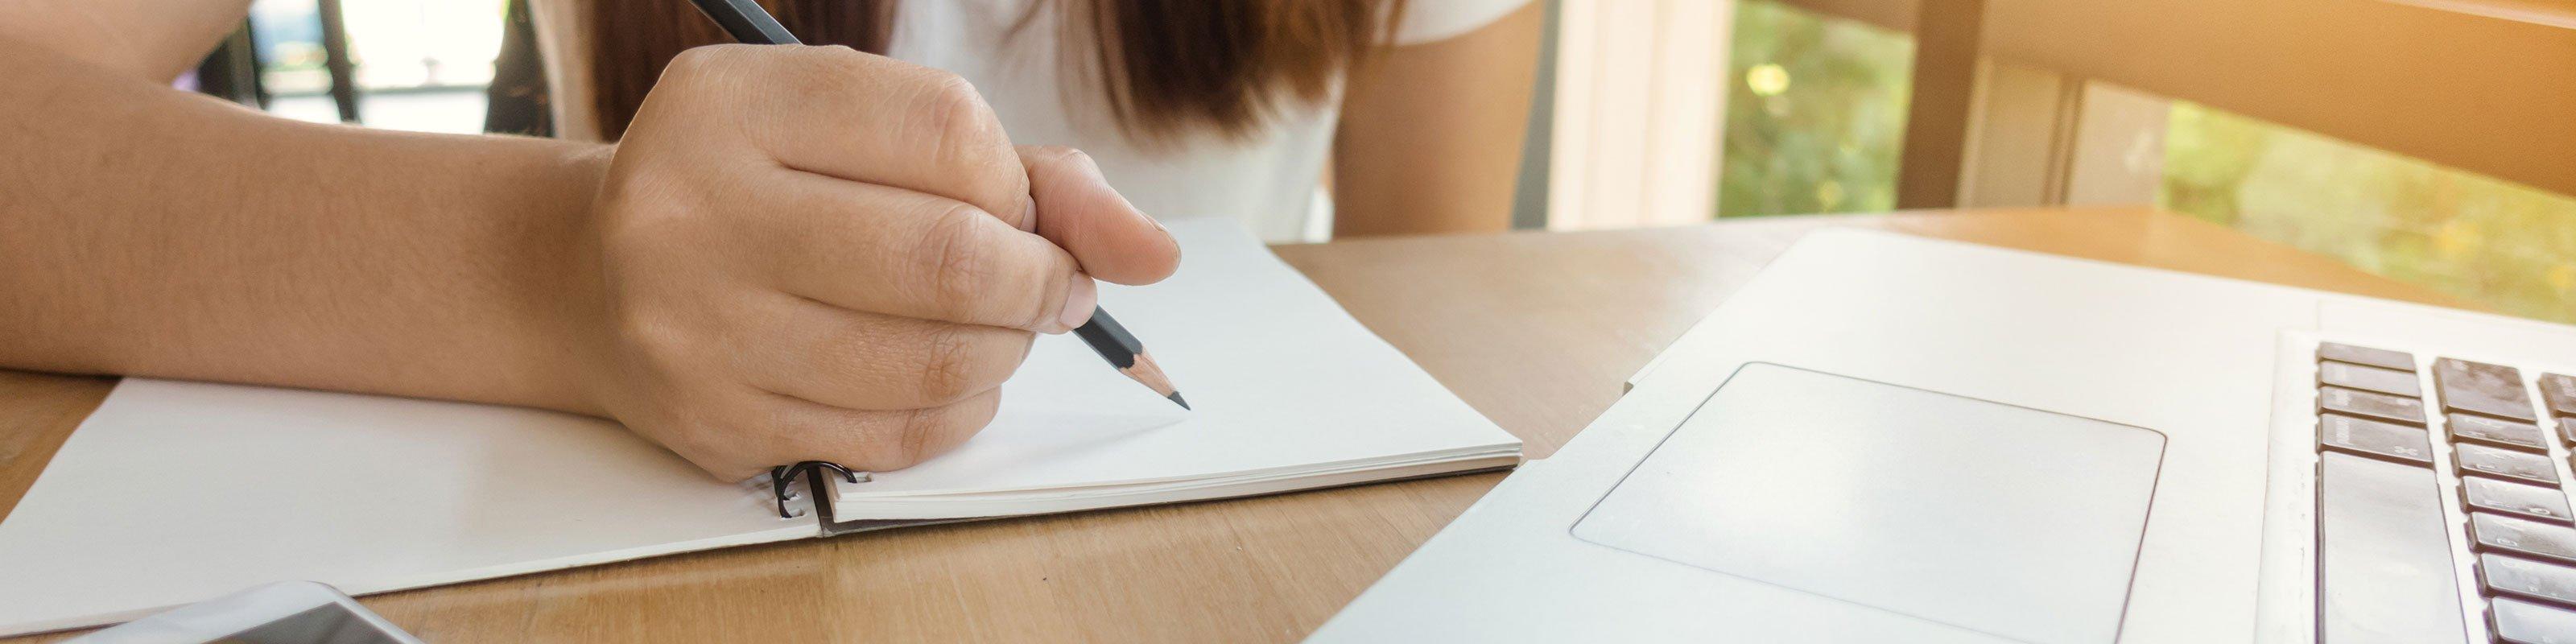 Extracurricular essay common application